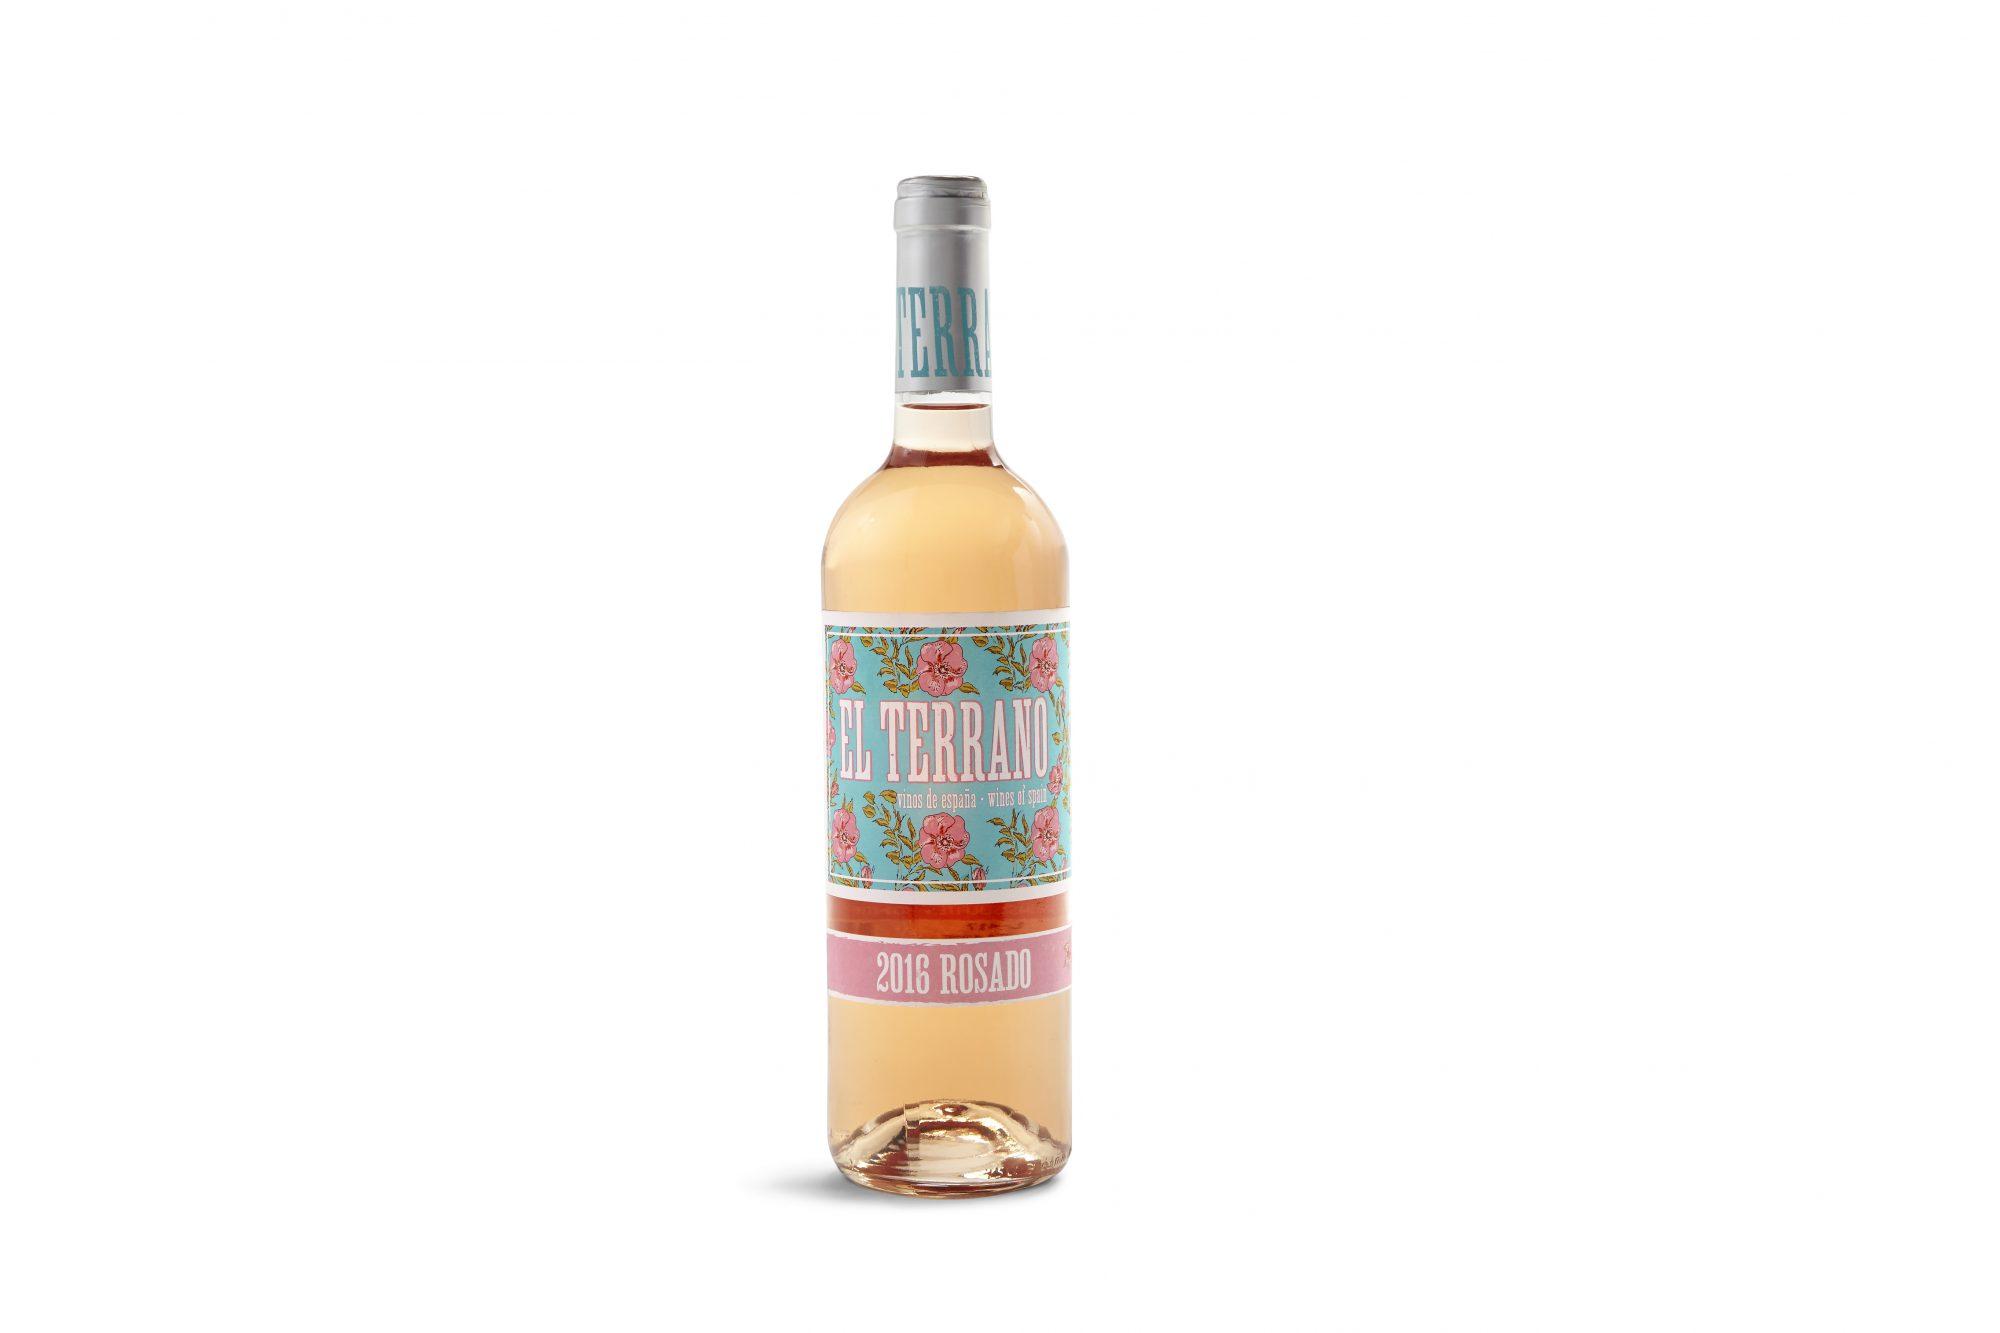 Rose_Wine_Program_El_Terrano_Rosado_750ml-018